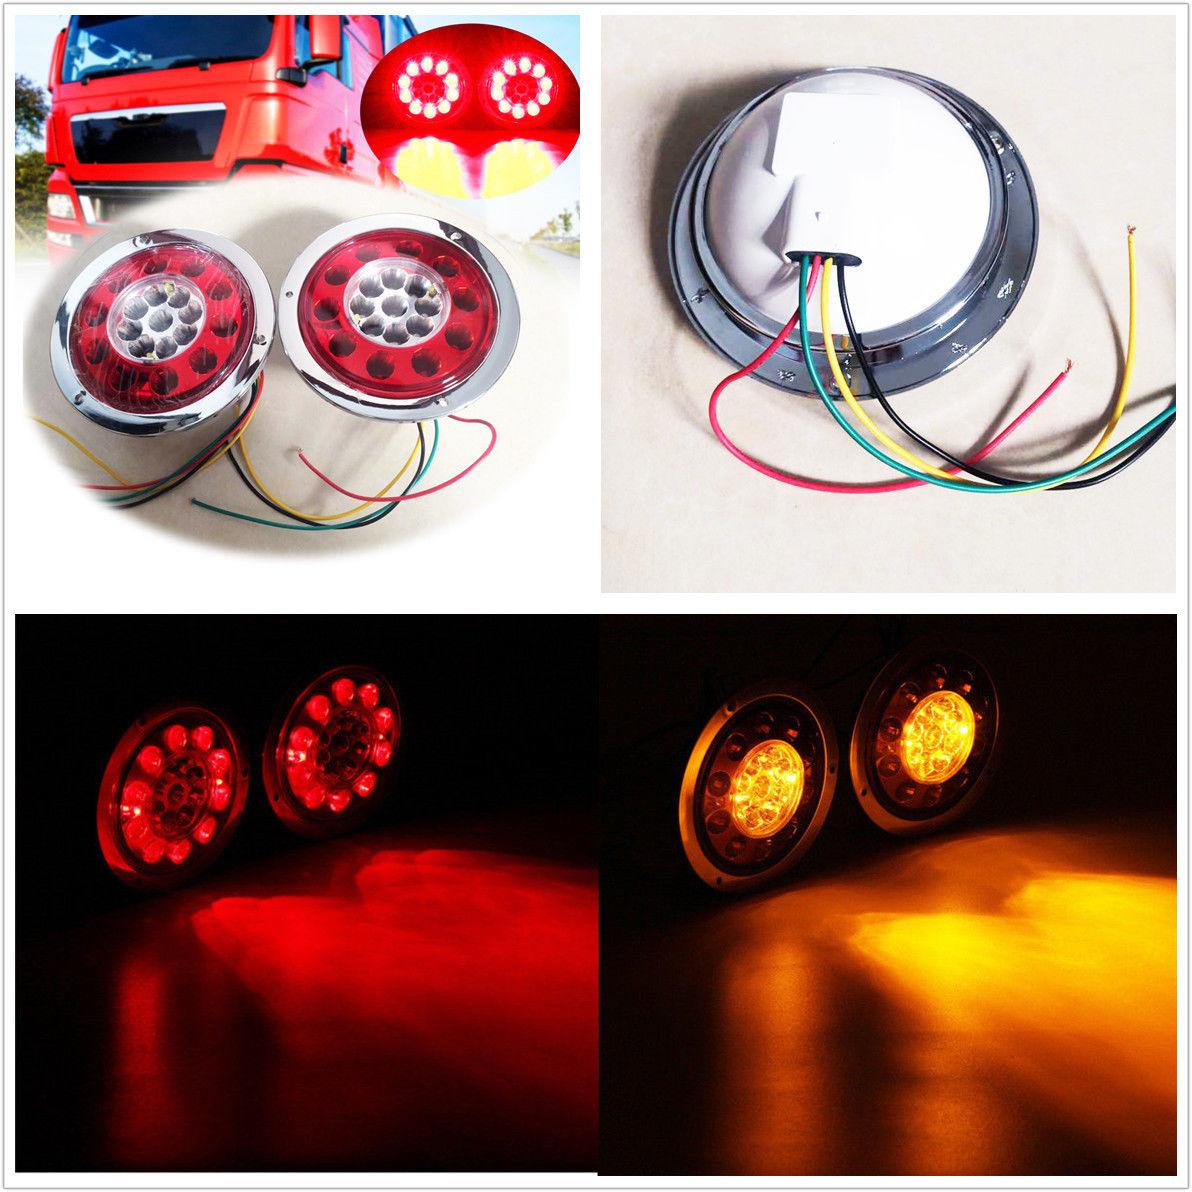 19 LED Car Truck Trailer Lorry Brake Stop Turn Tail Light Lamp 12V/24V Red yellow